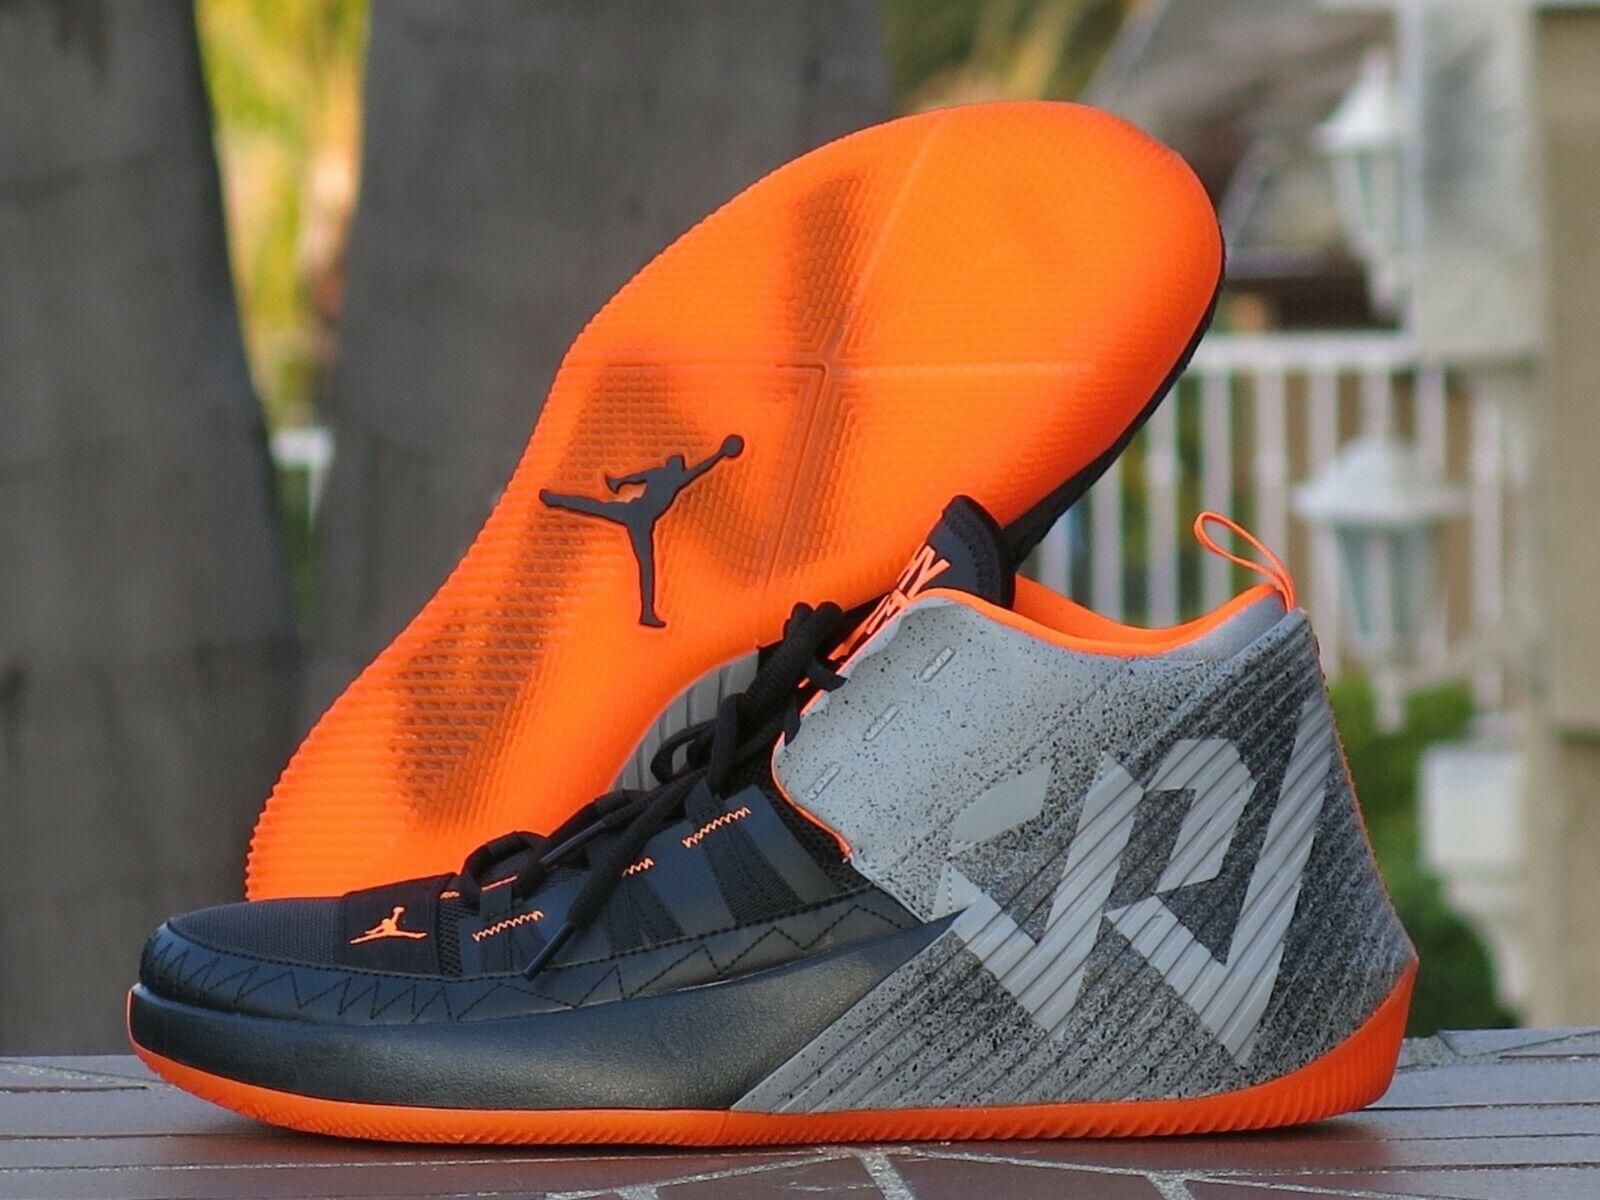 Nike Air Jordan Why Not Zero.1 Choas Men's Basketball Sneakers BV5498-008